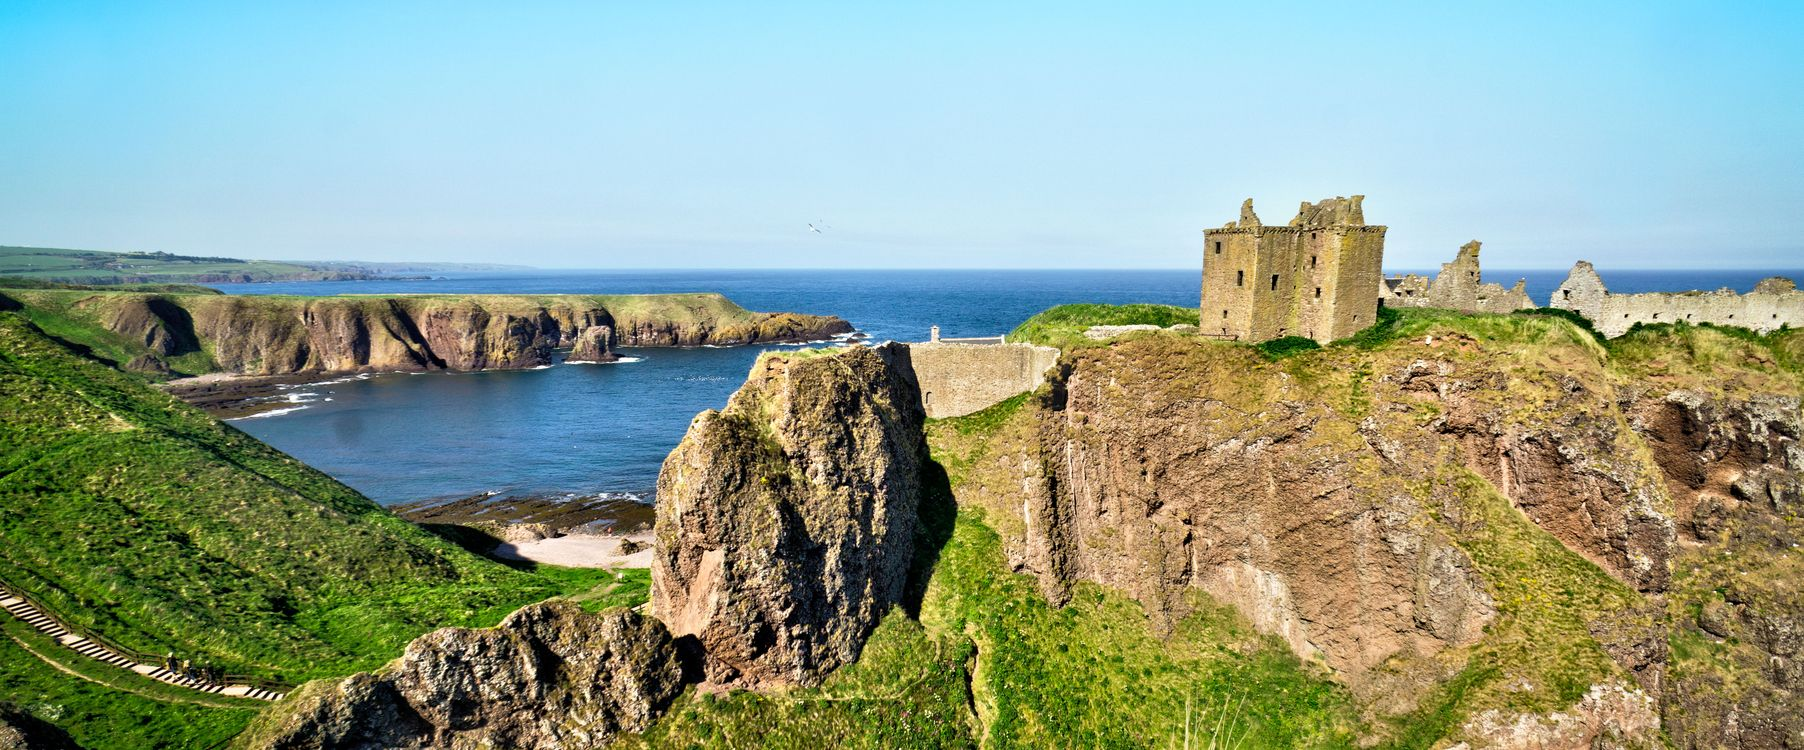 Фото бесплатно Dunnottar Castle, Rock, Scotland, United Kingdom, пейзажи